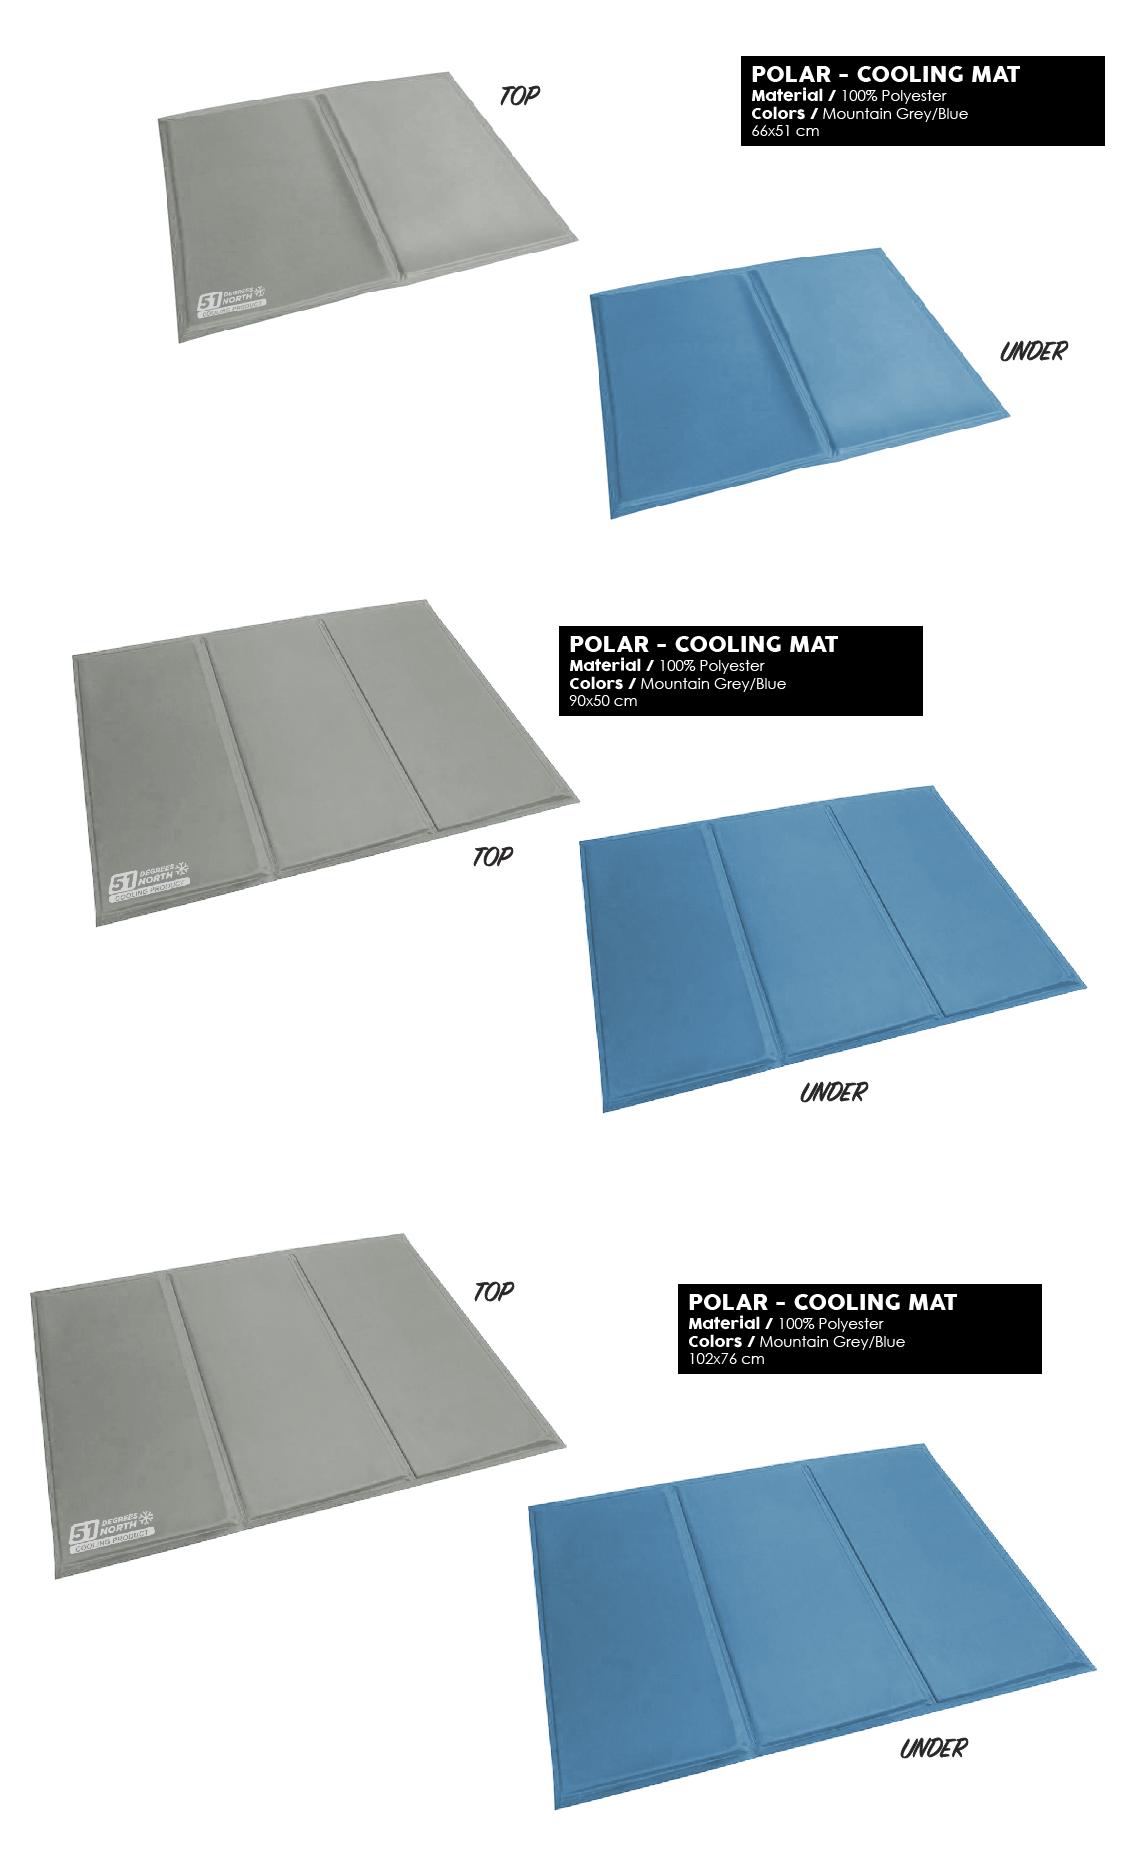 51 Degrees North Sleep Polar cooling mat mountain grey blue